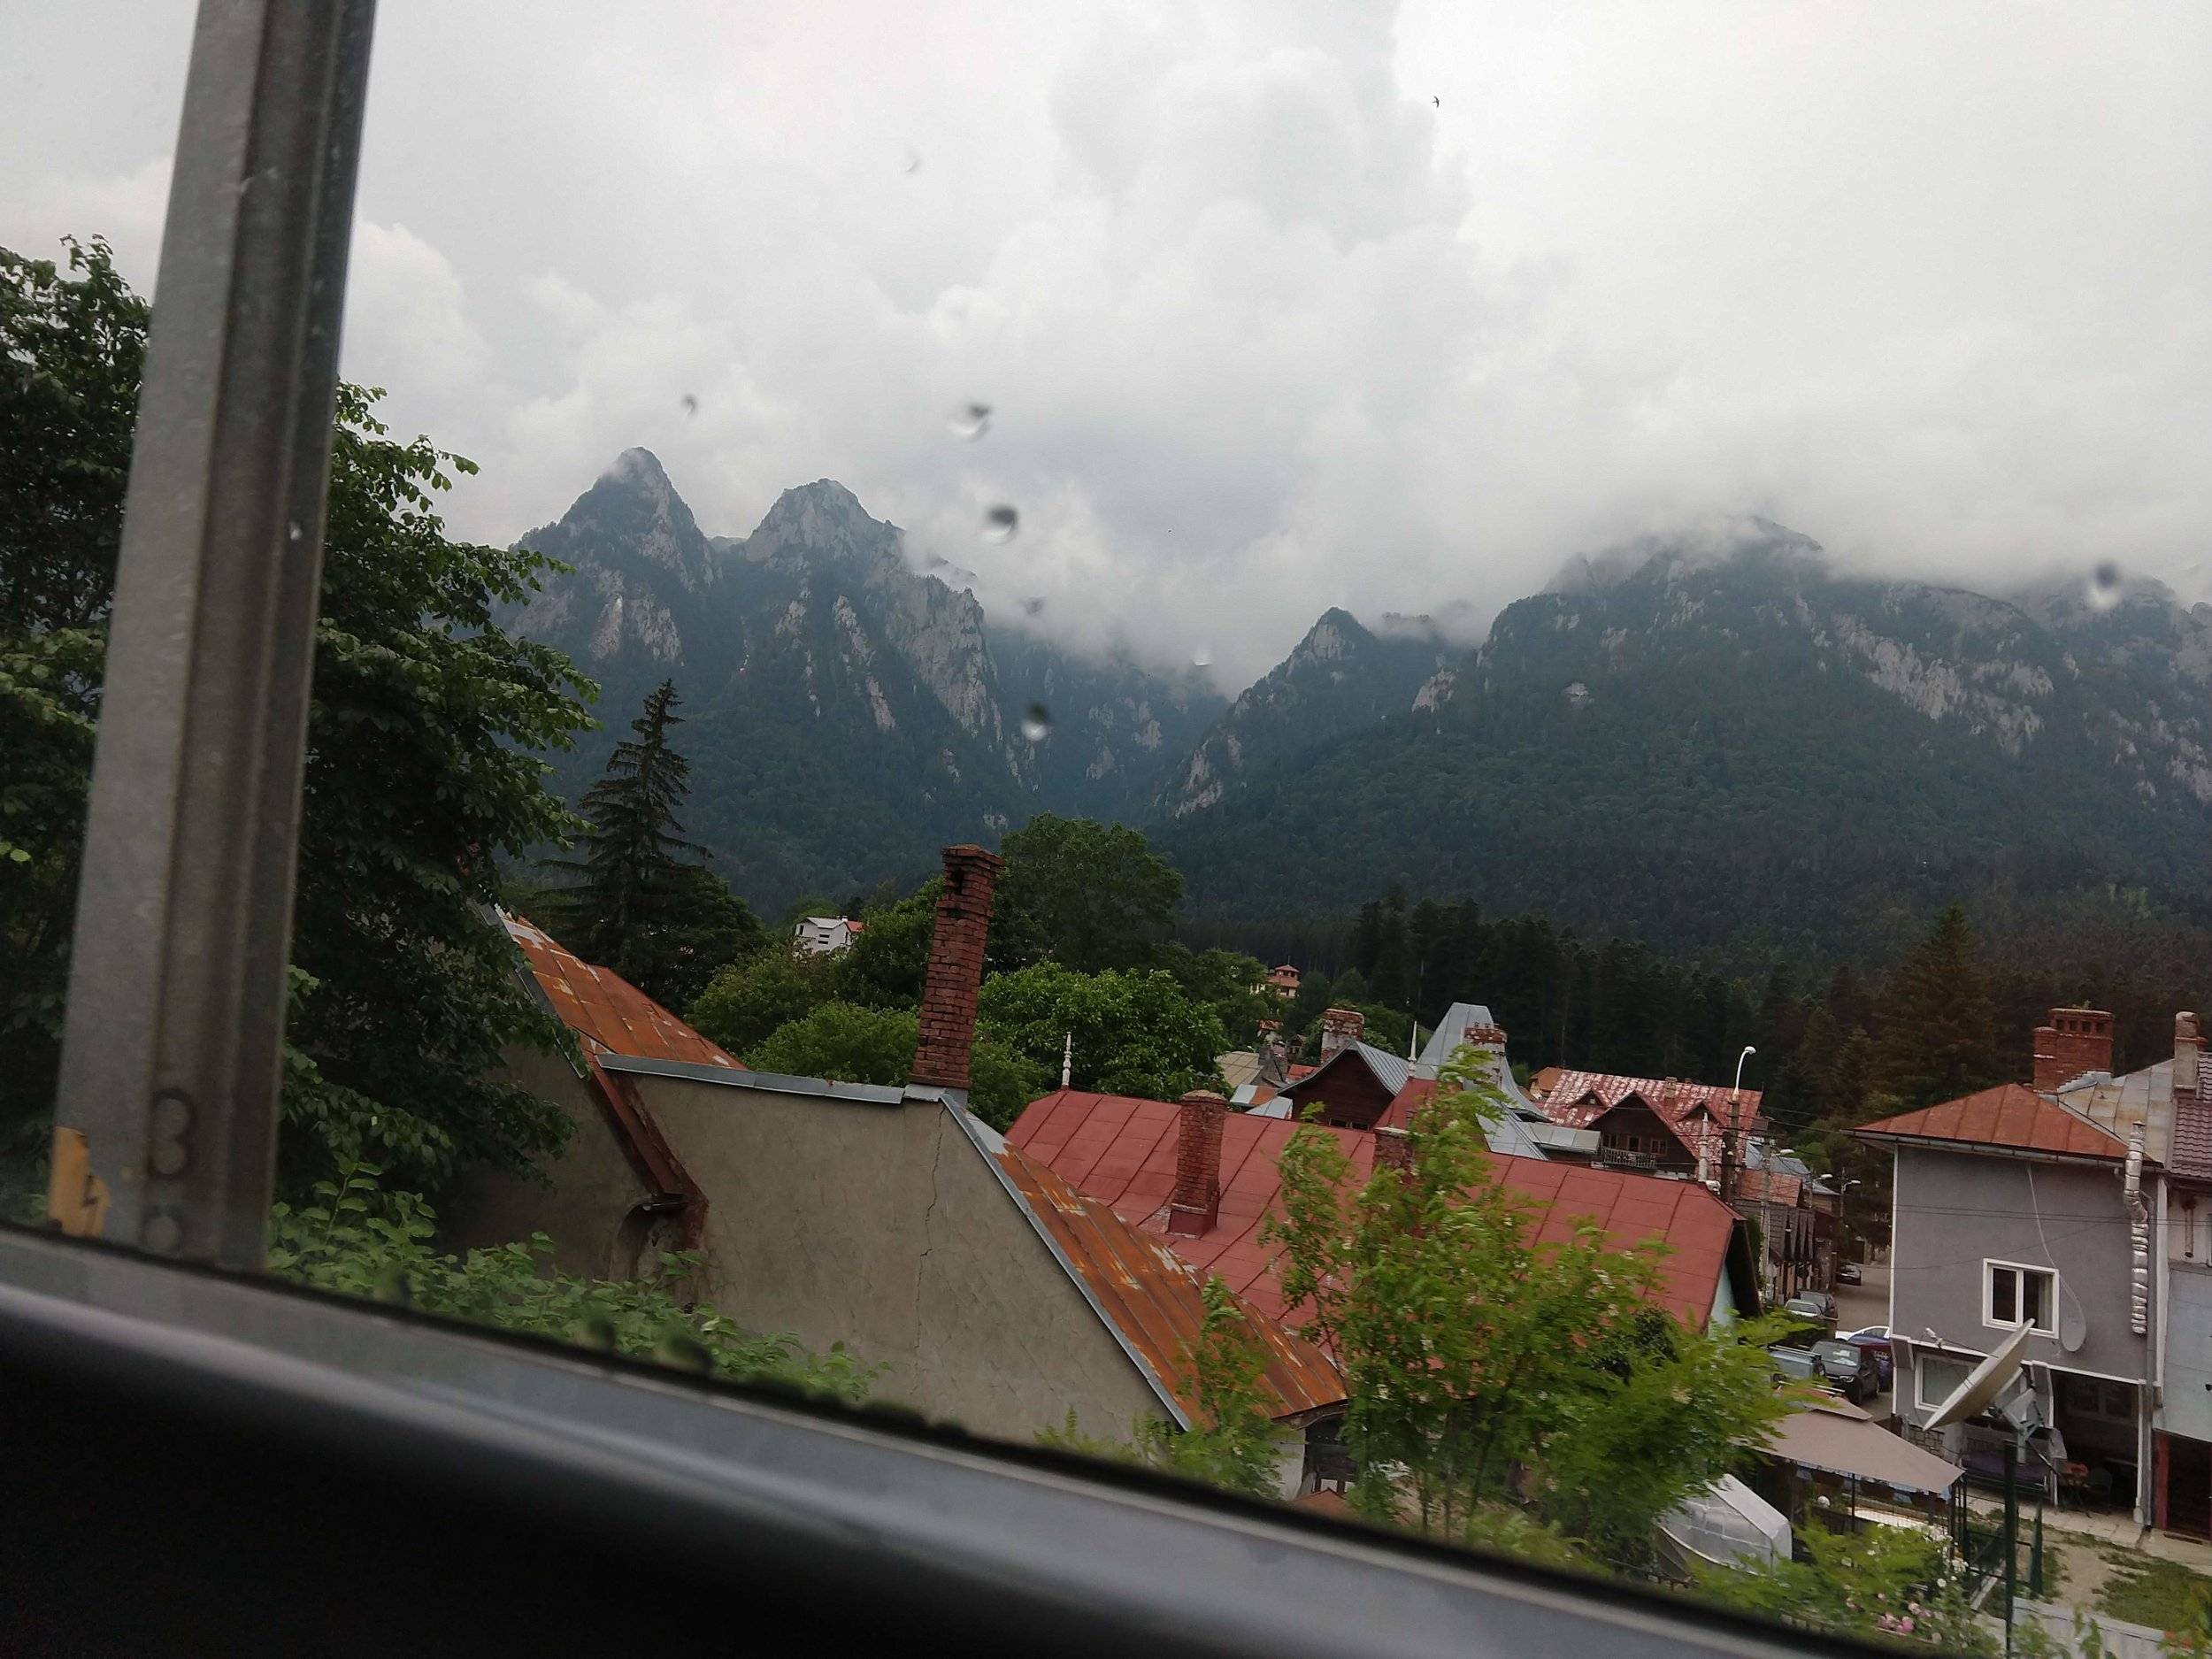 A glimpse of the mountains near Romania's Predeal pass.